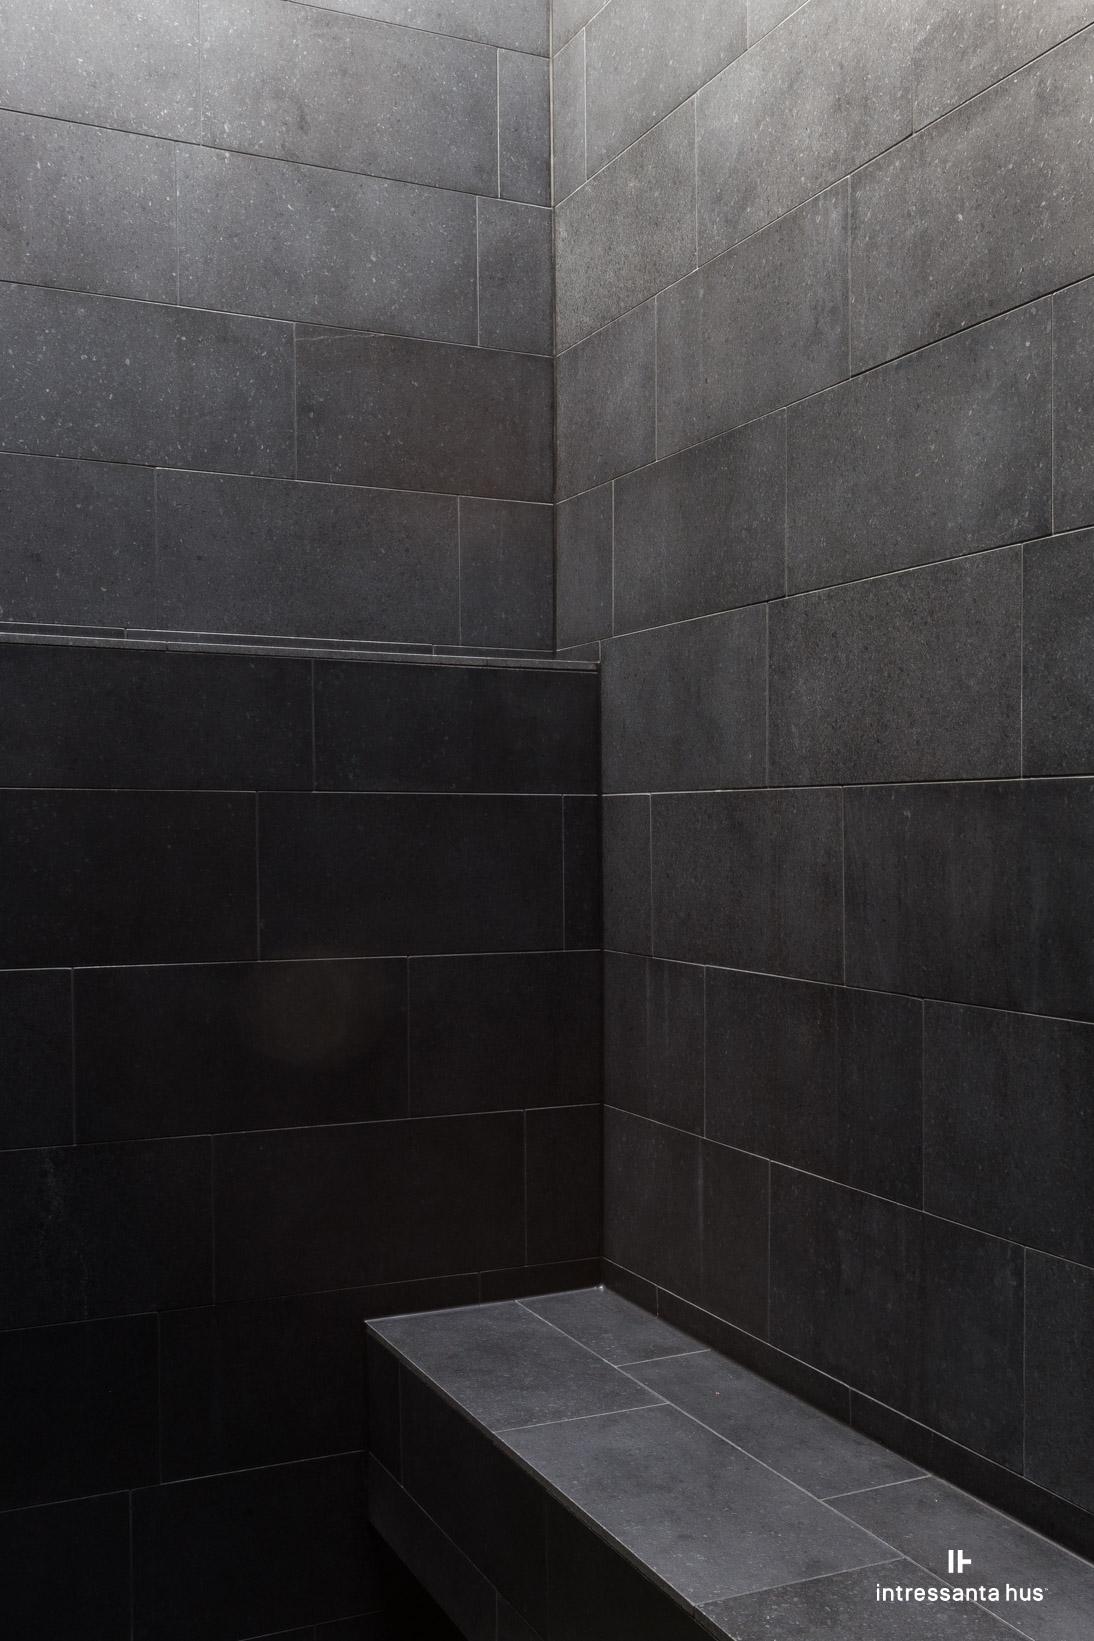 intressantahus-tyreso-018-4